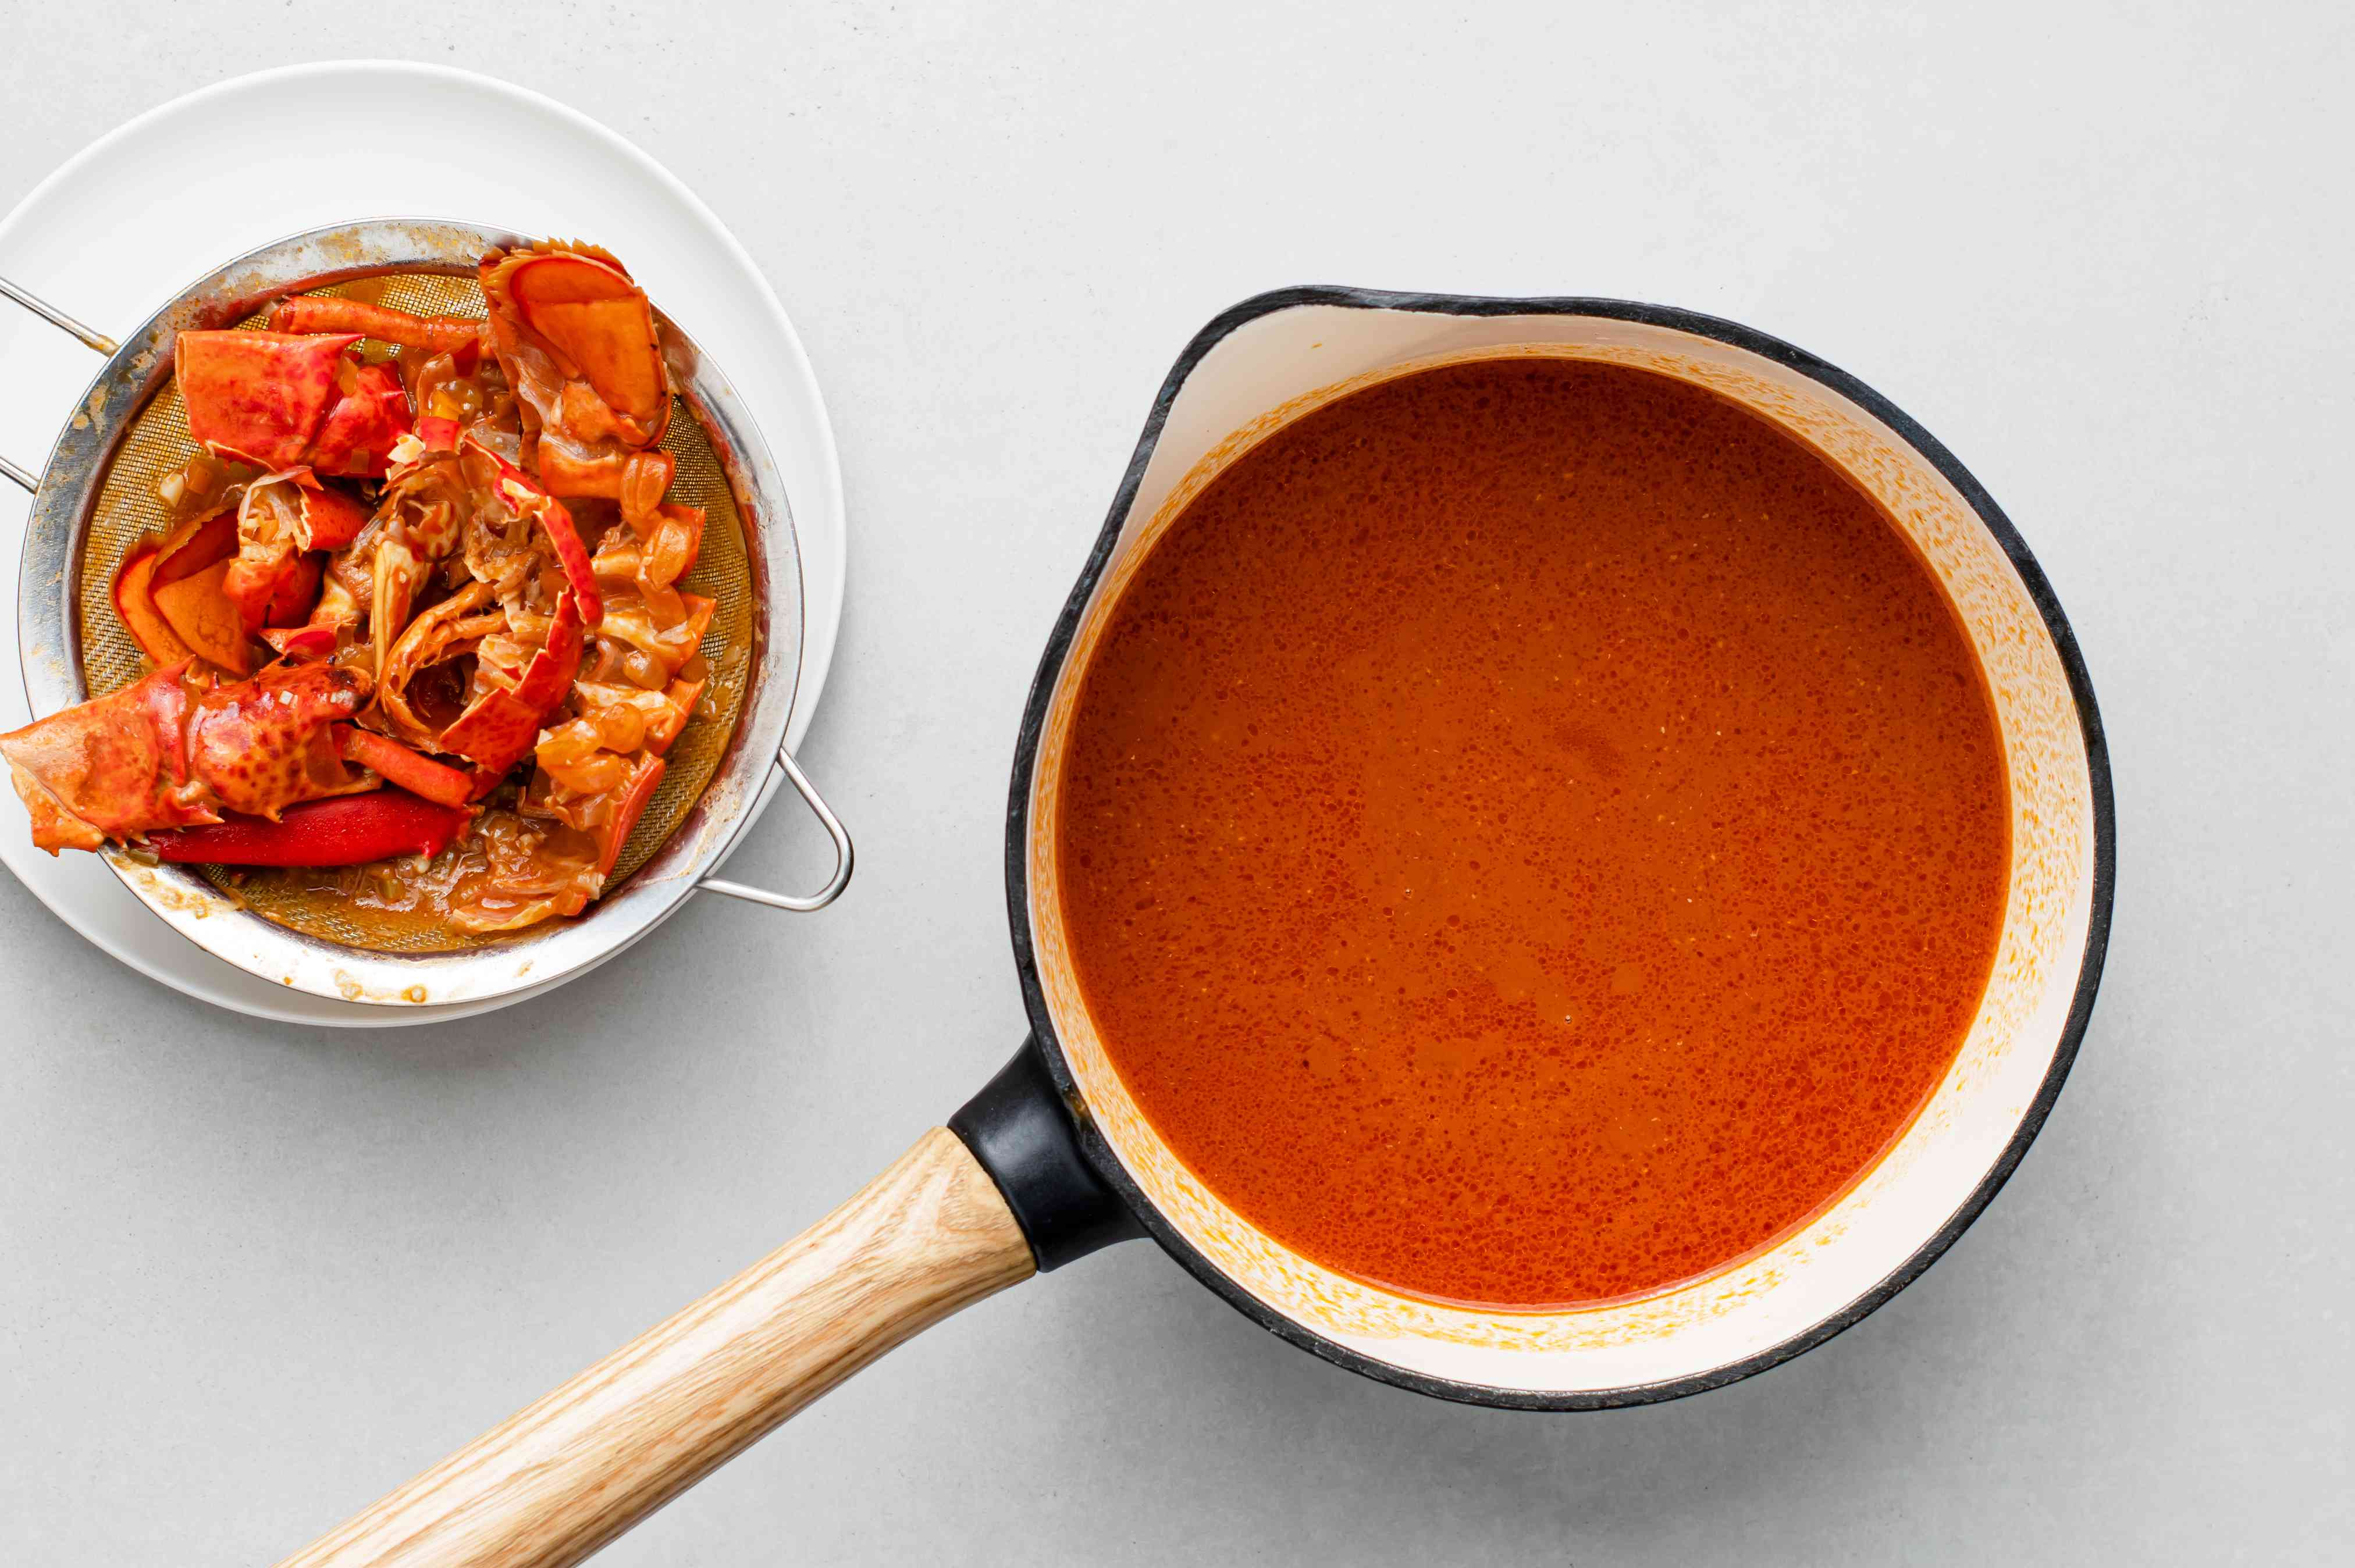 strain the sauce into a saucepan